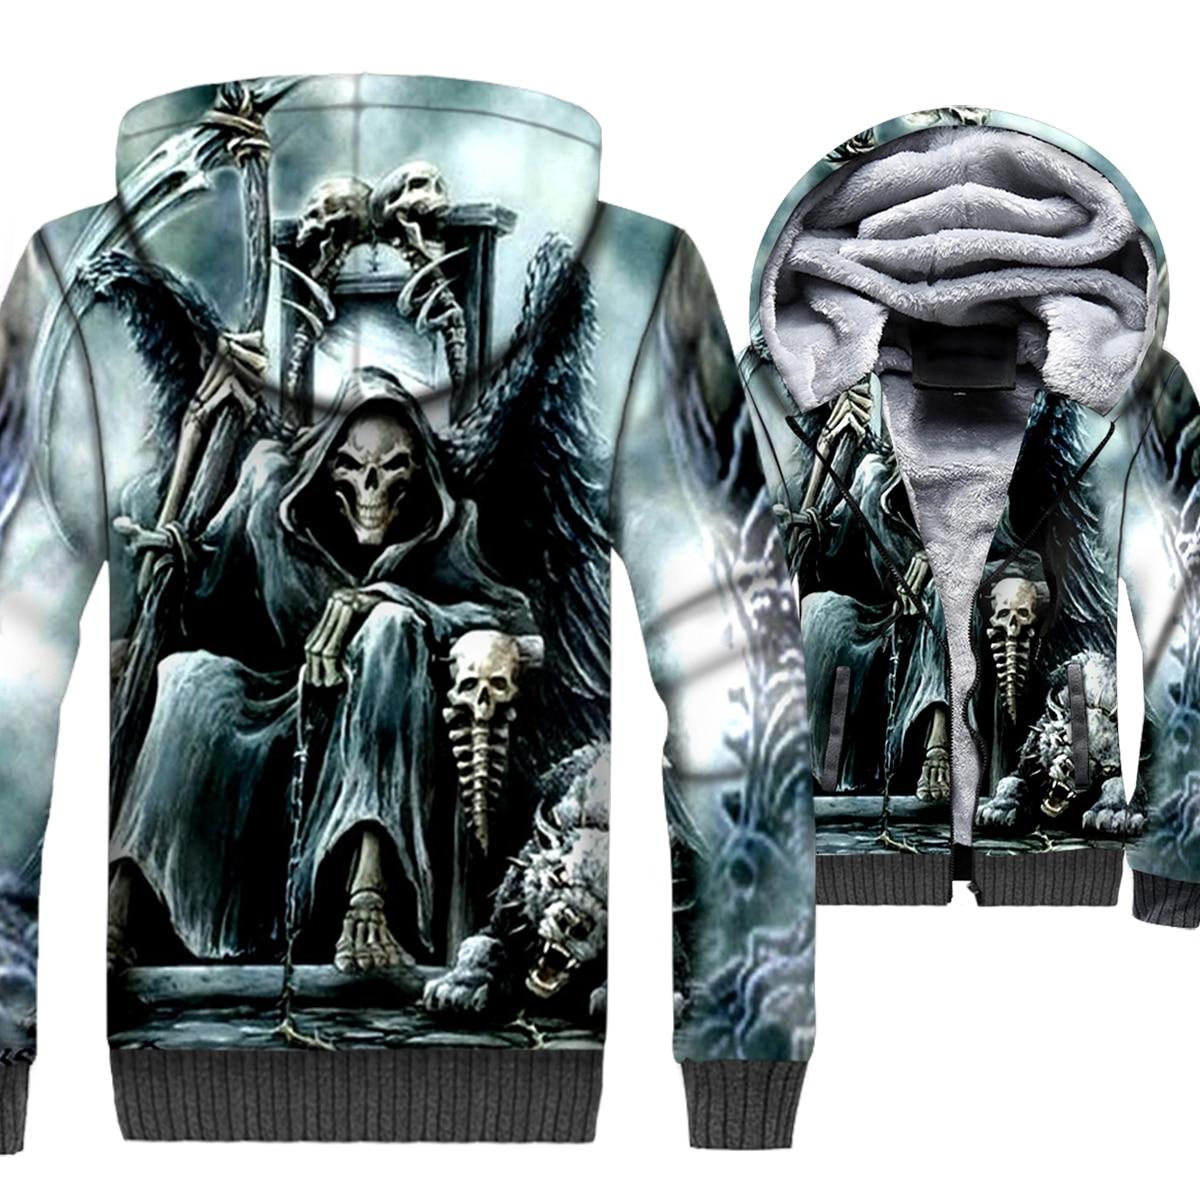 Flame Skull Jacket Men 3D Hoodies Skeleton Gothic Sweatshirt 2018 Winter Thick Fleece Warm Zipper Coat Swag Hip-Hop Sportswear